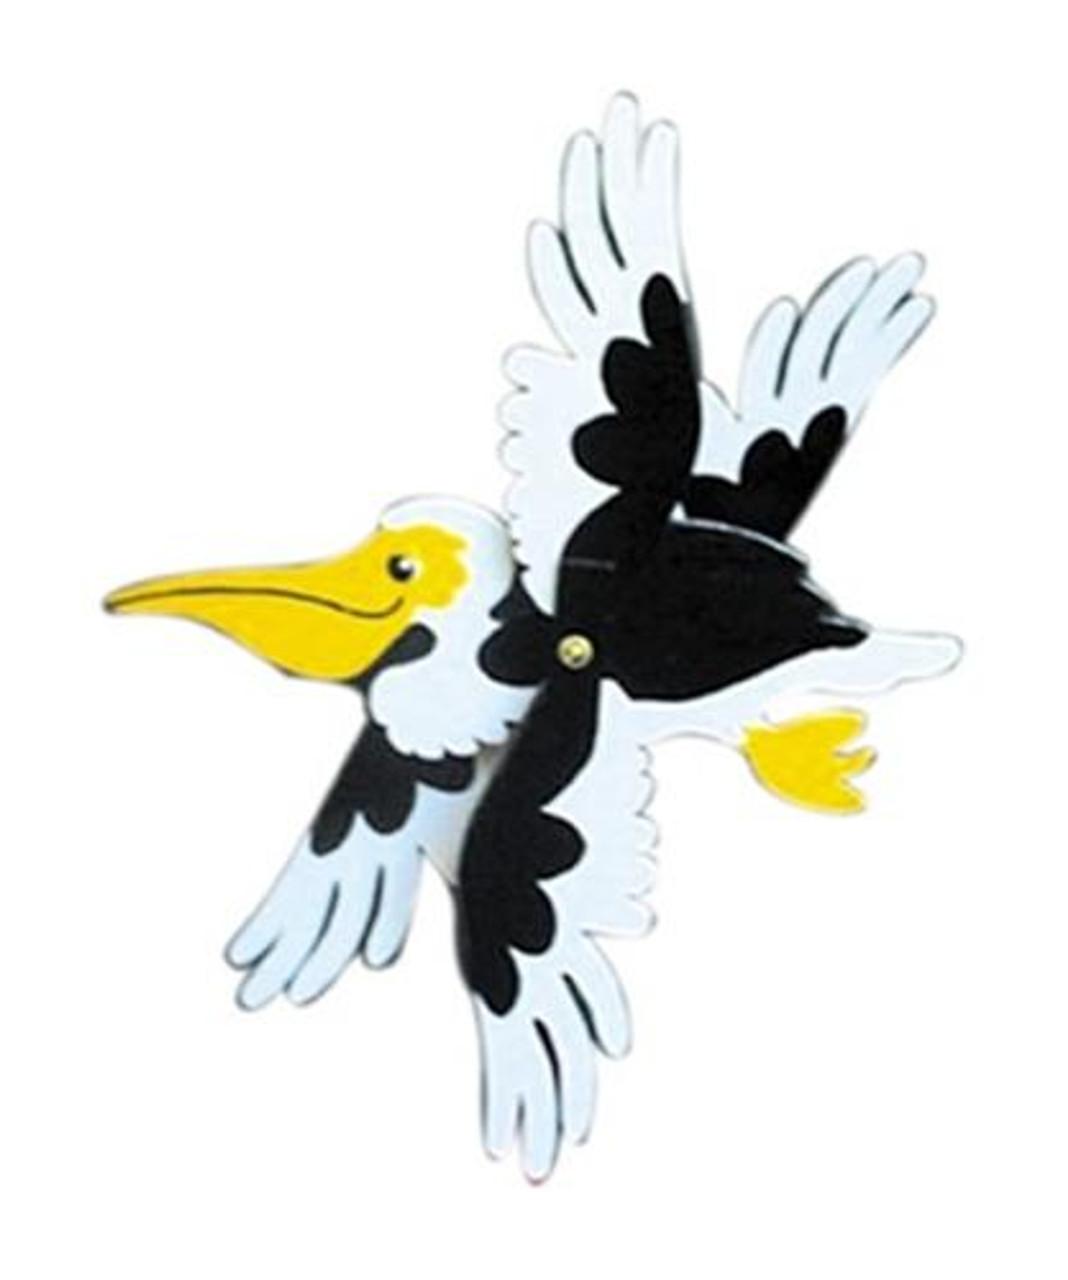 Cherry Tree Toys Pelican Whirligig Hardware Kit